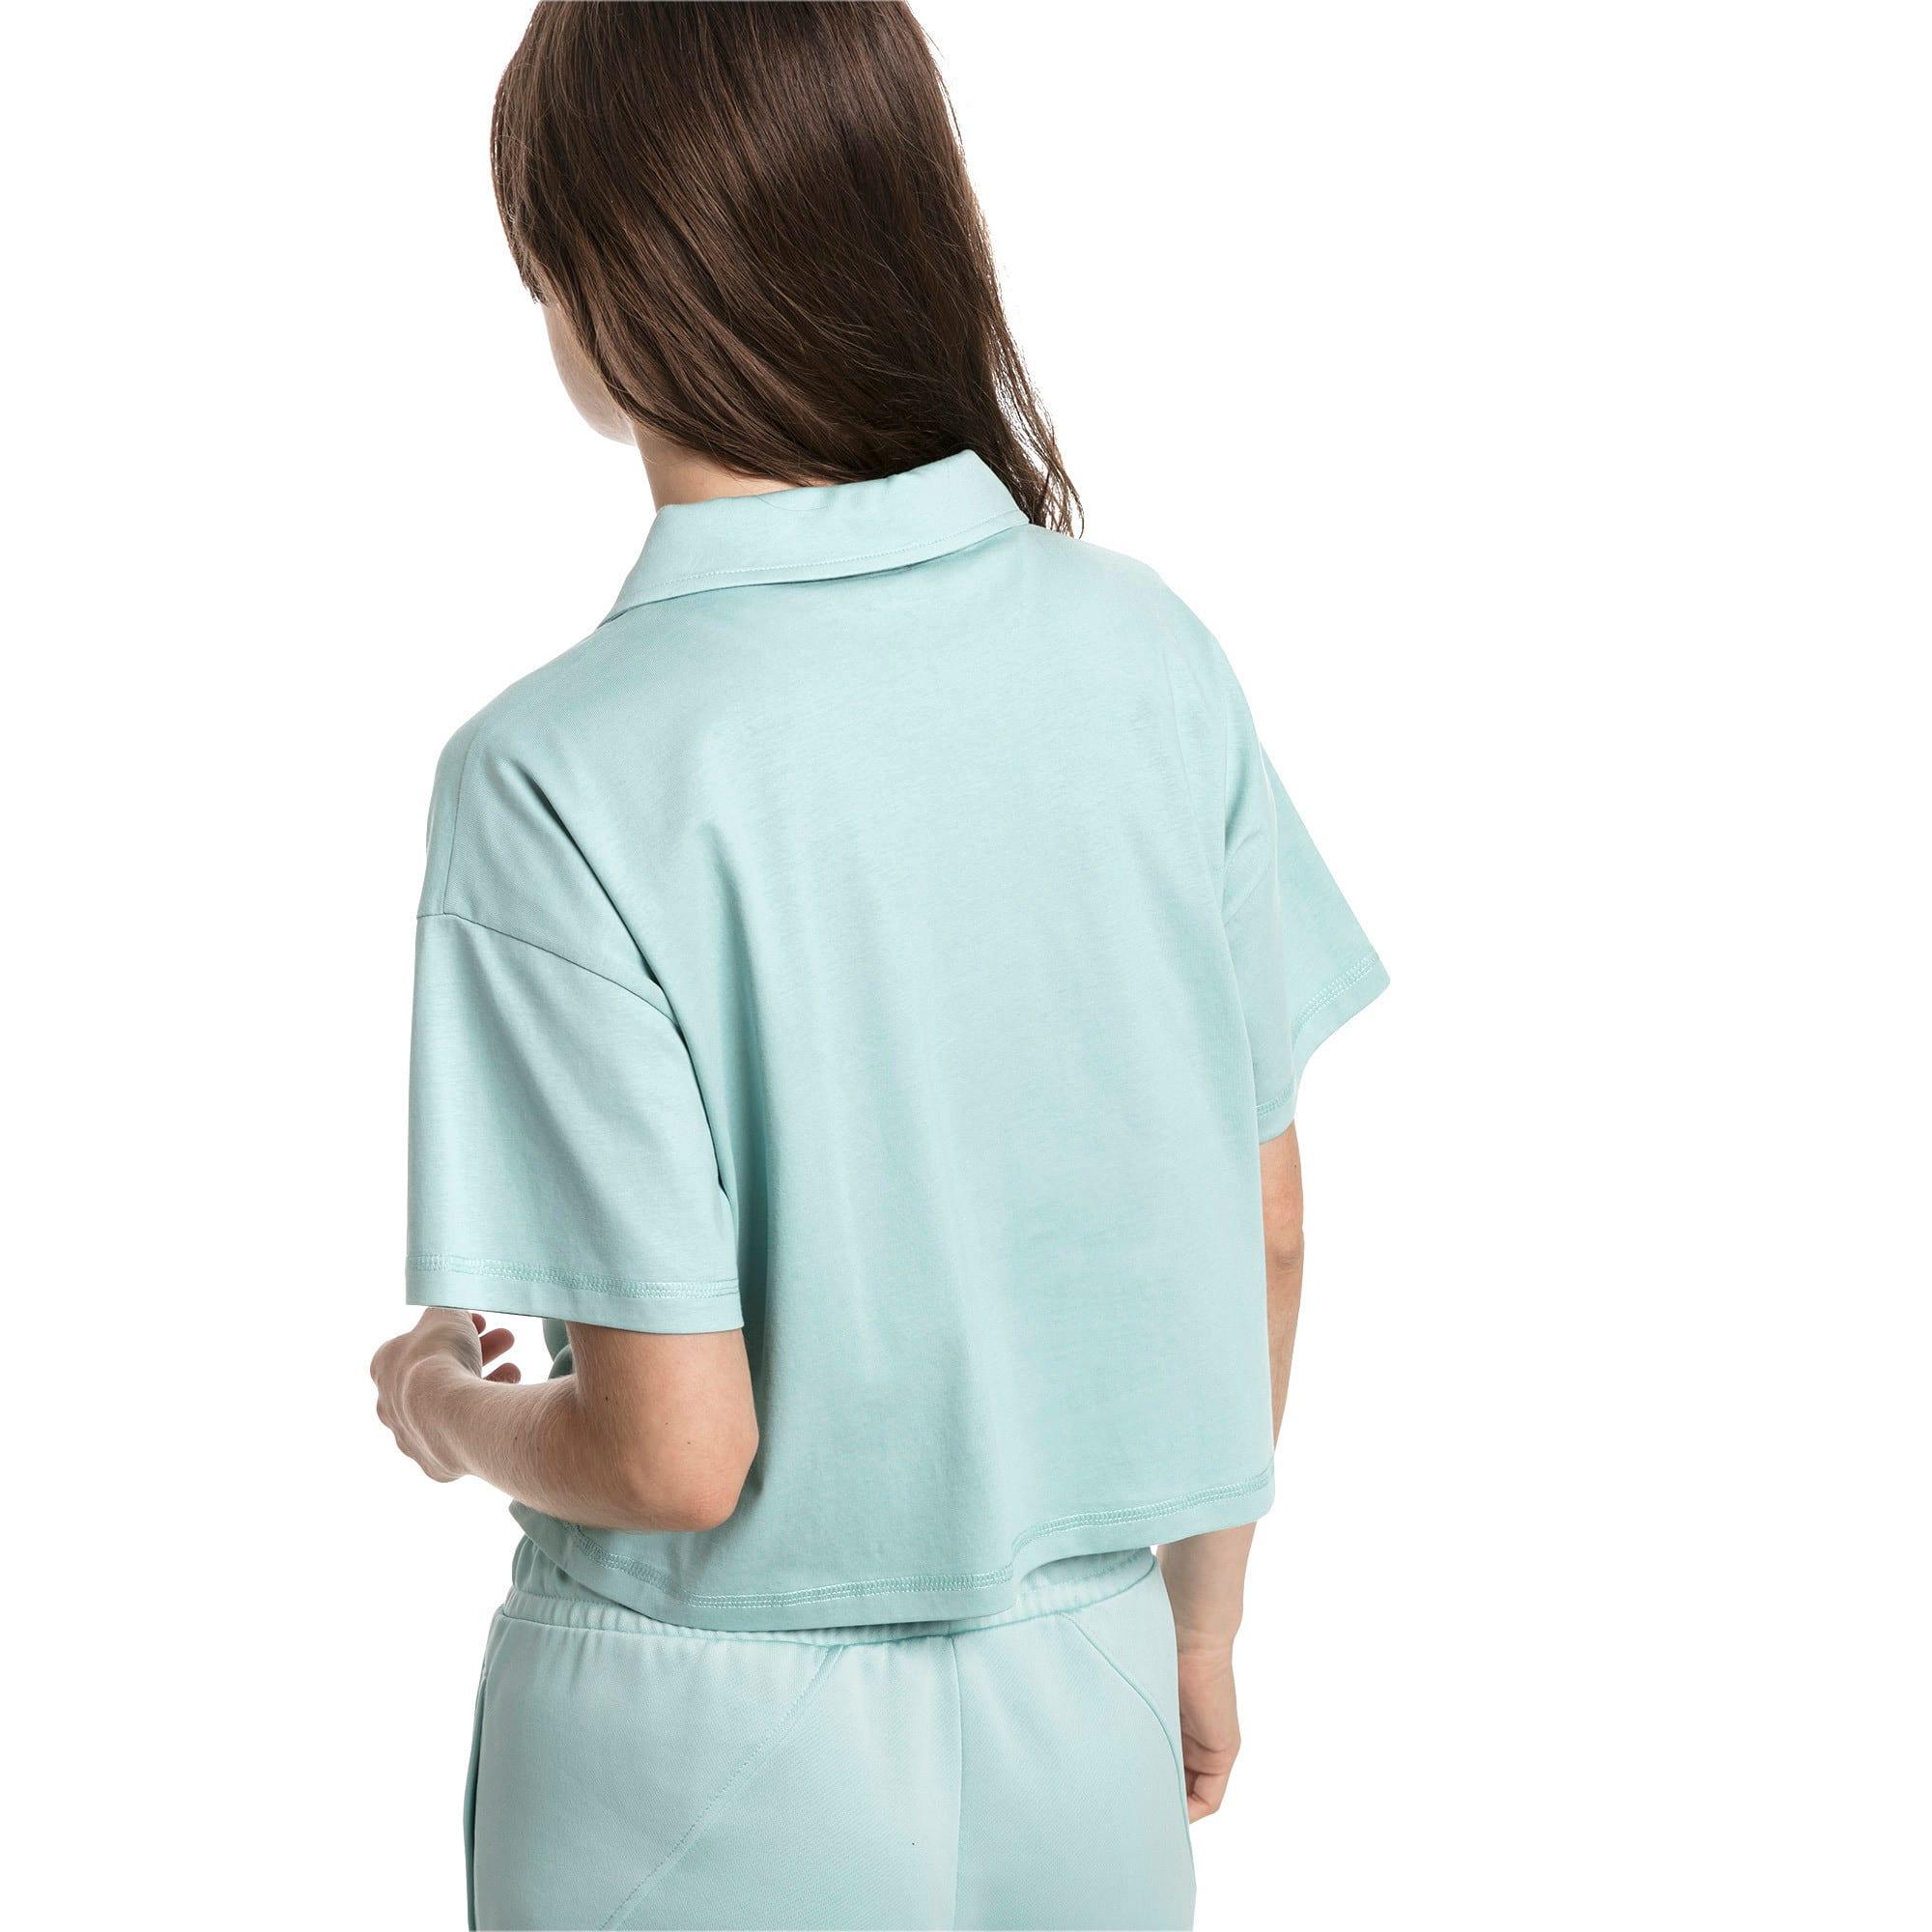 Thumbnail 2 of Downtown Women's Polo Shirt, Aquifer, medium-IND